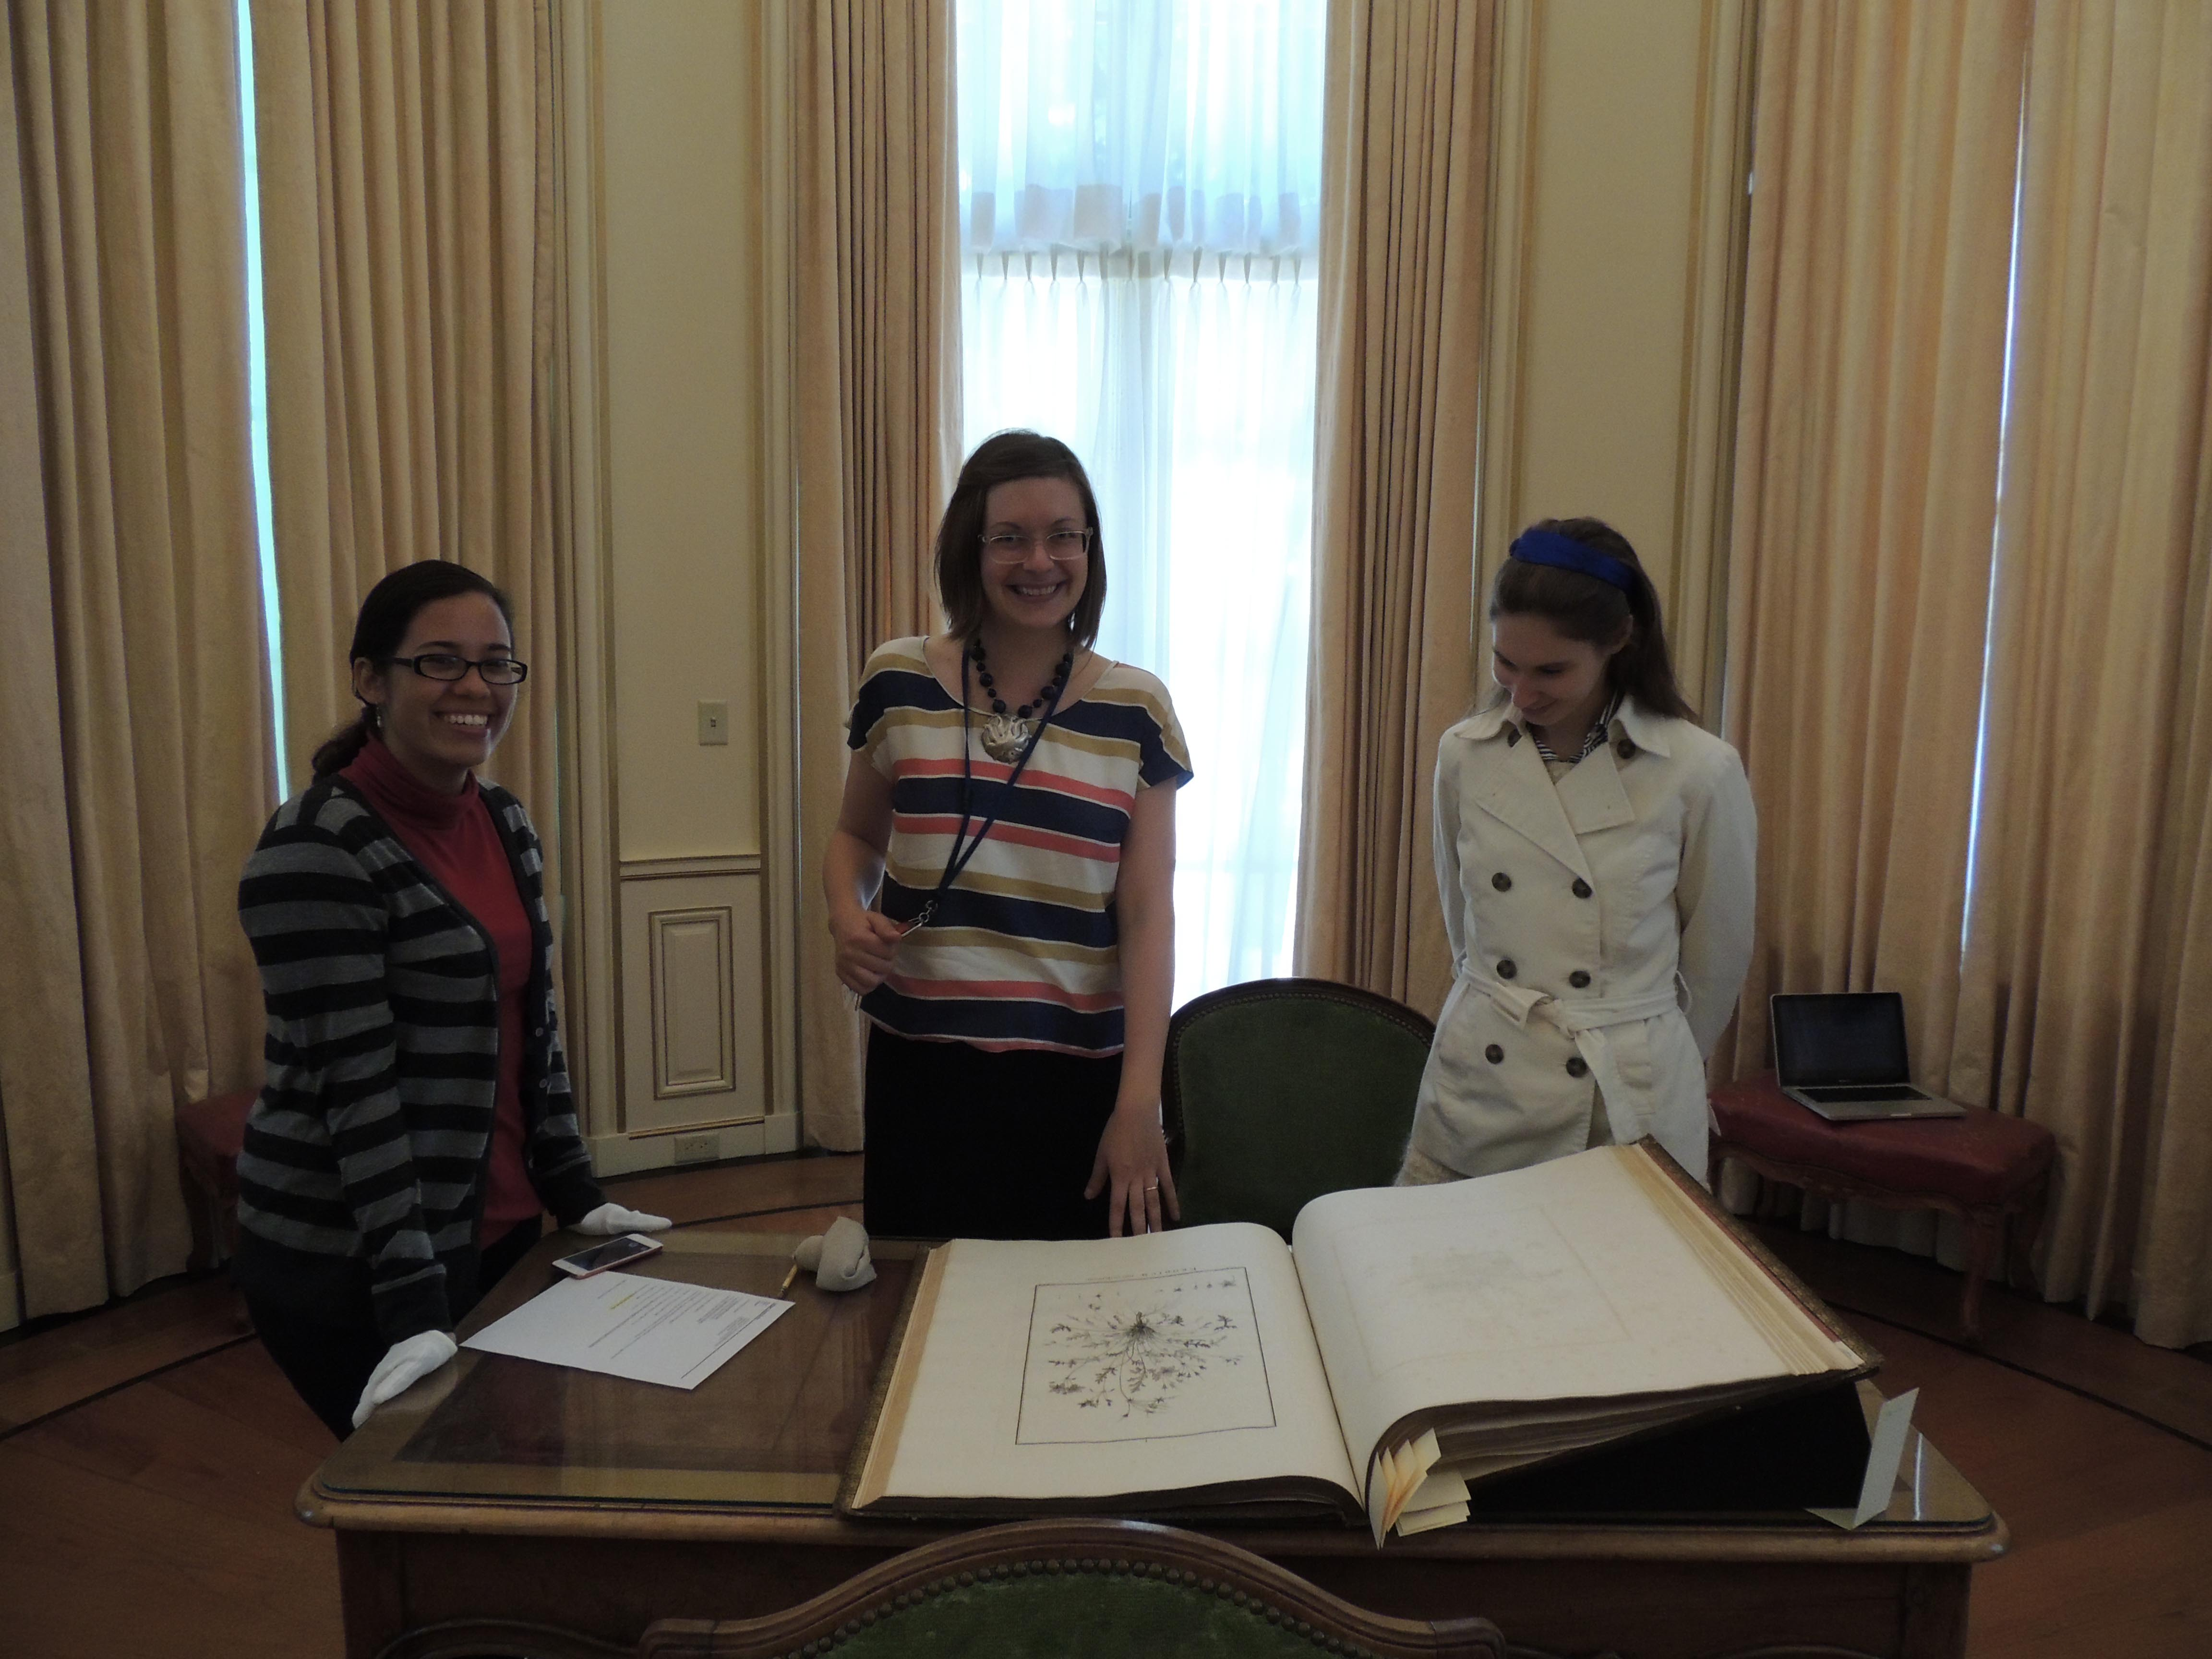 Jasmine, Sarah, and Deirdre in the Rare Book Reading Room